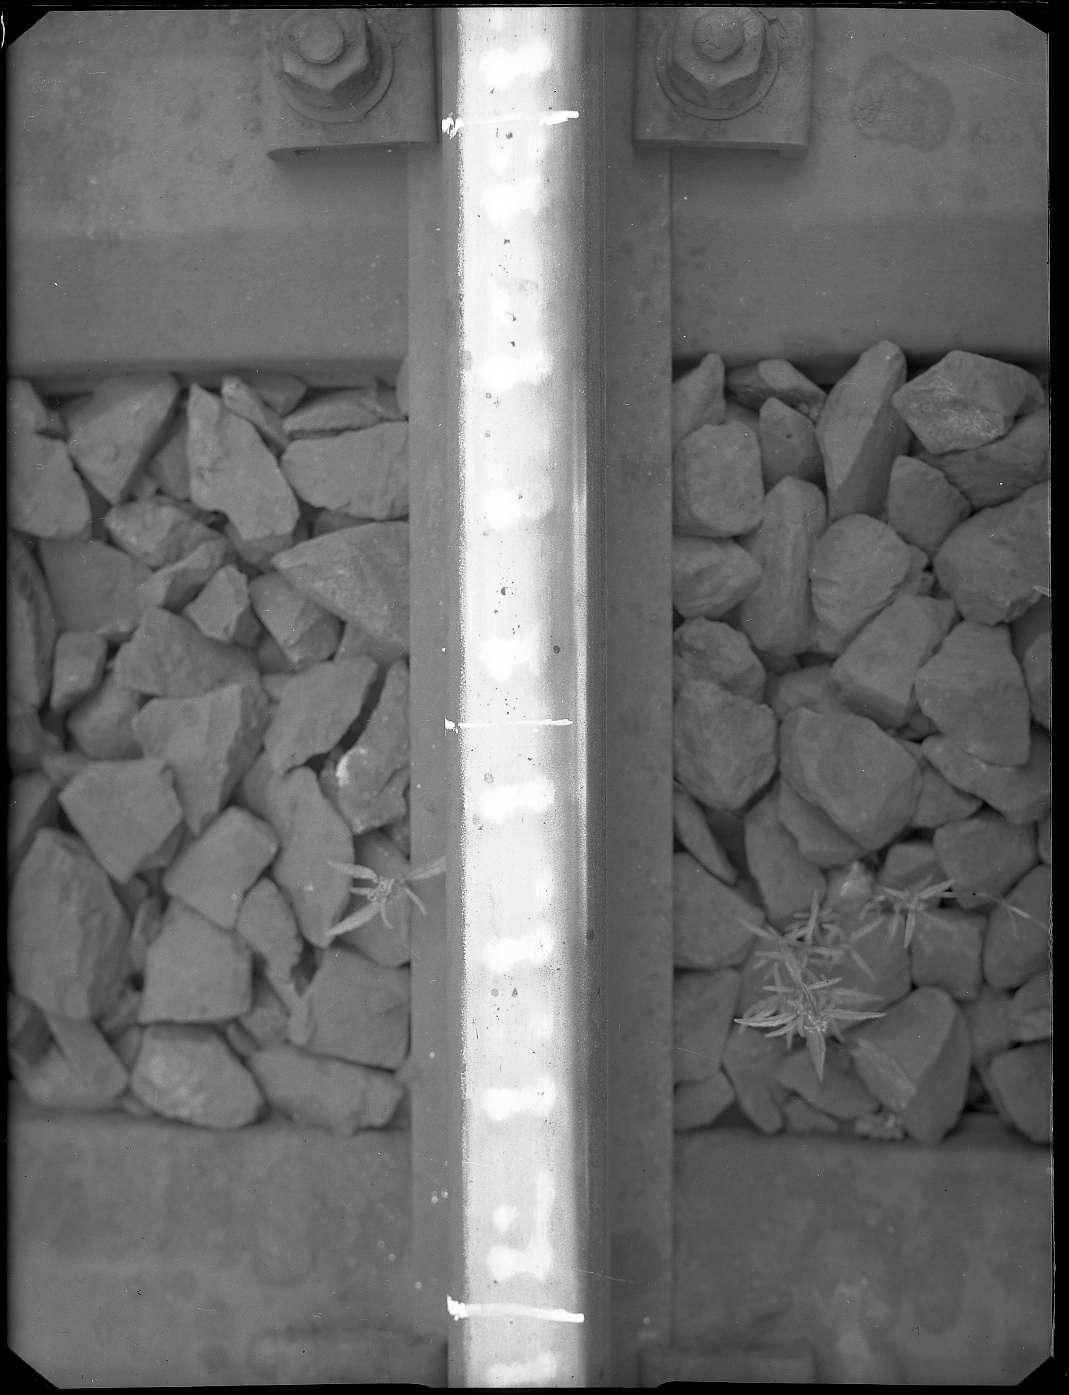 Sindelfingen, Strecke Stuttgart-Horb, Block Mönchsbrunnen, Riffelbildung an Schienen, Abb. b